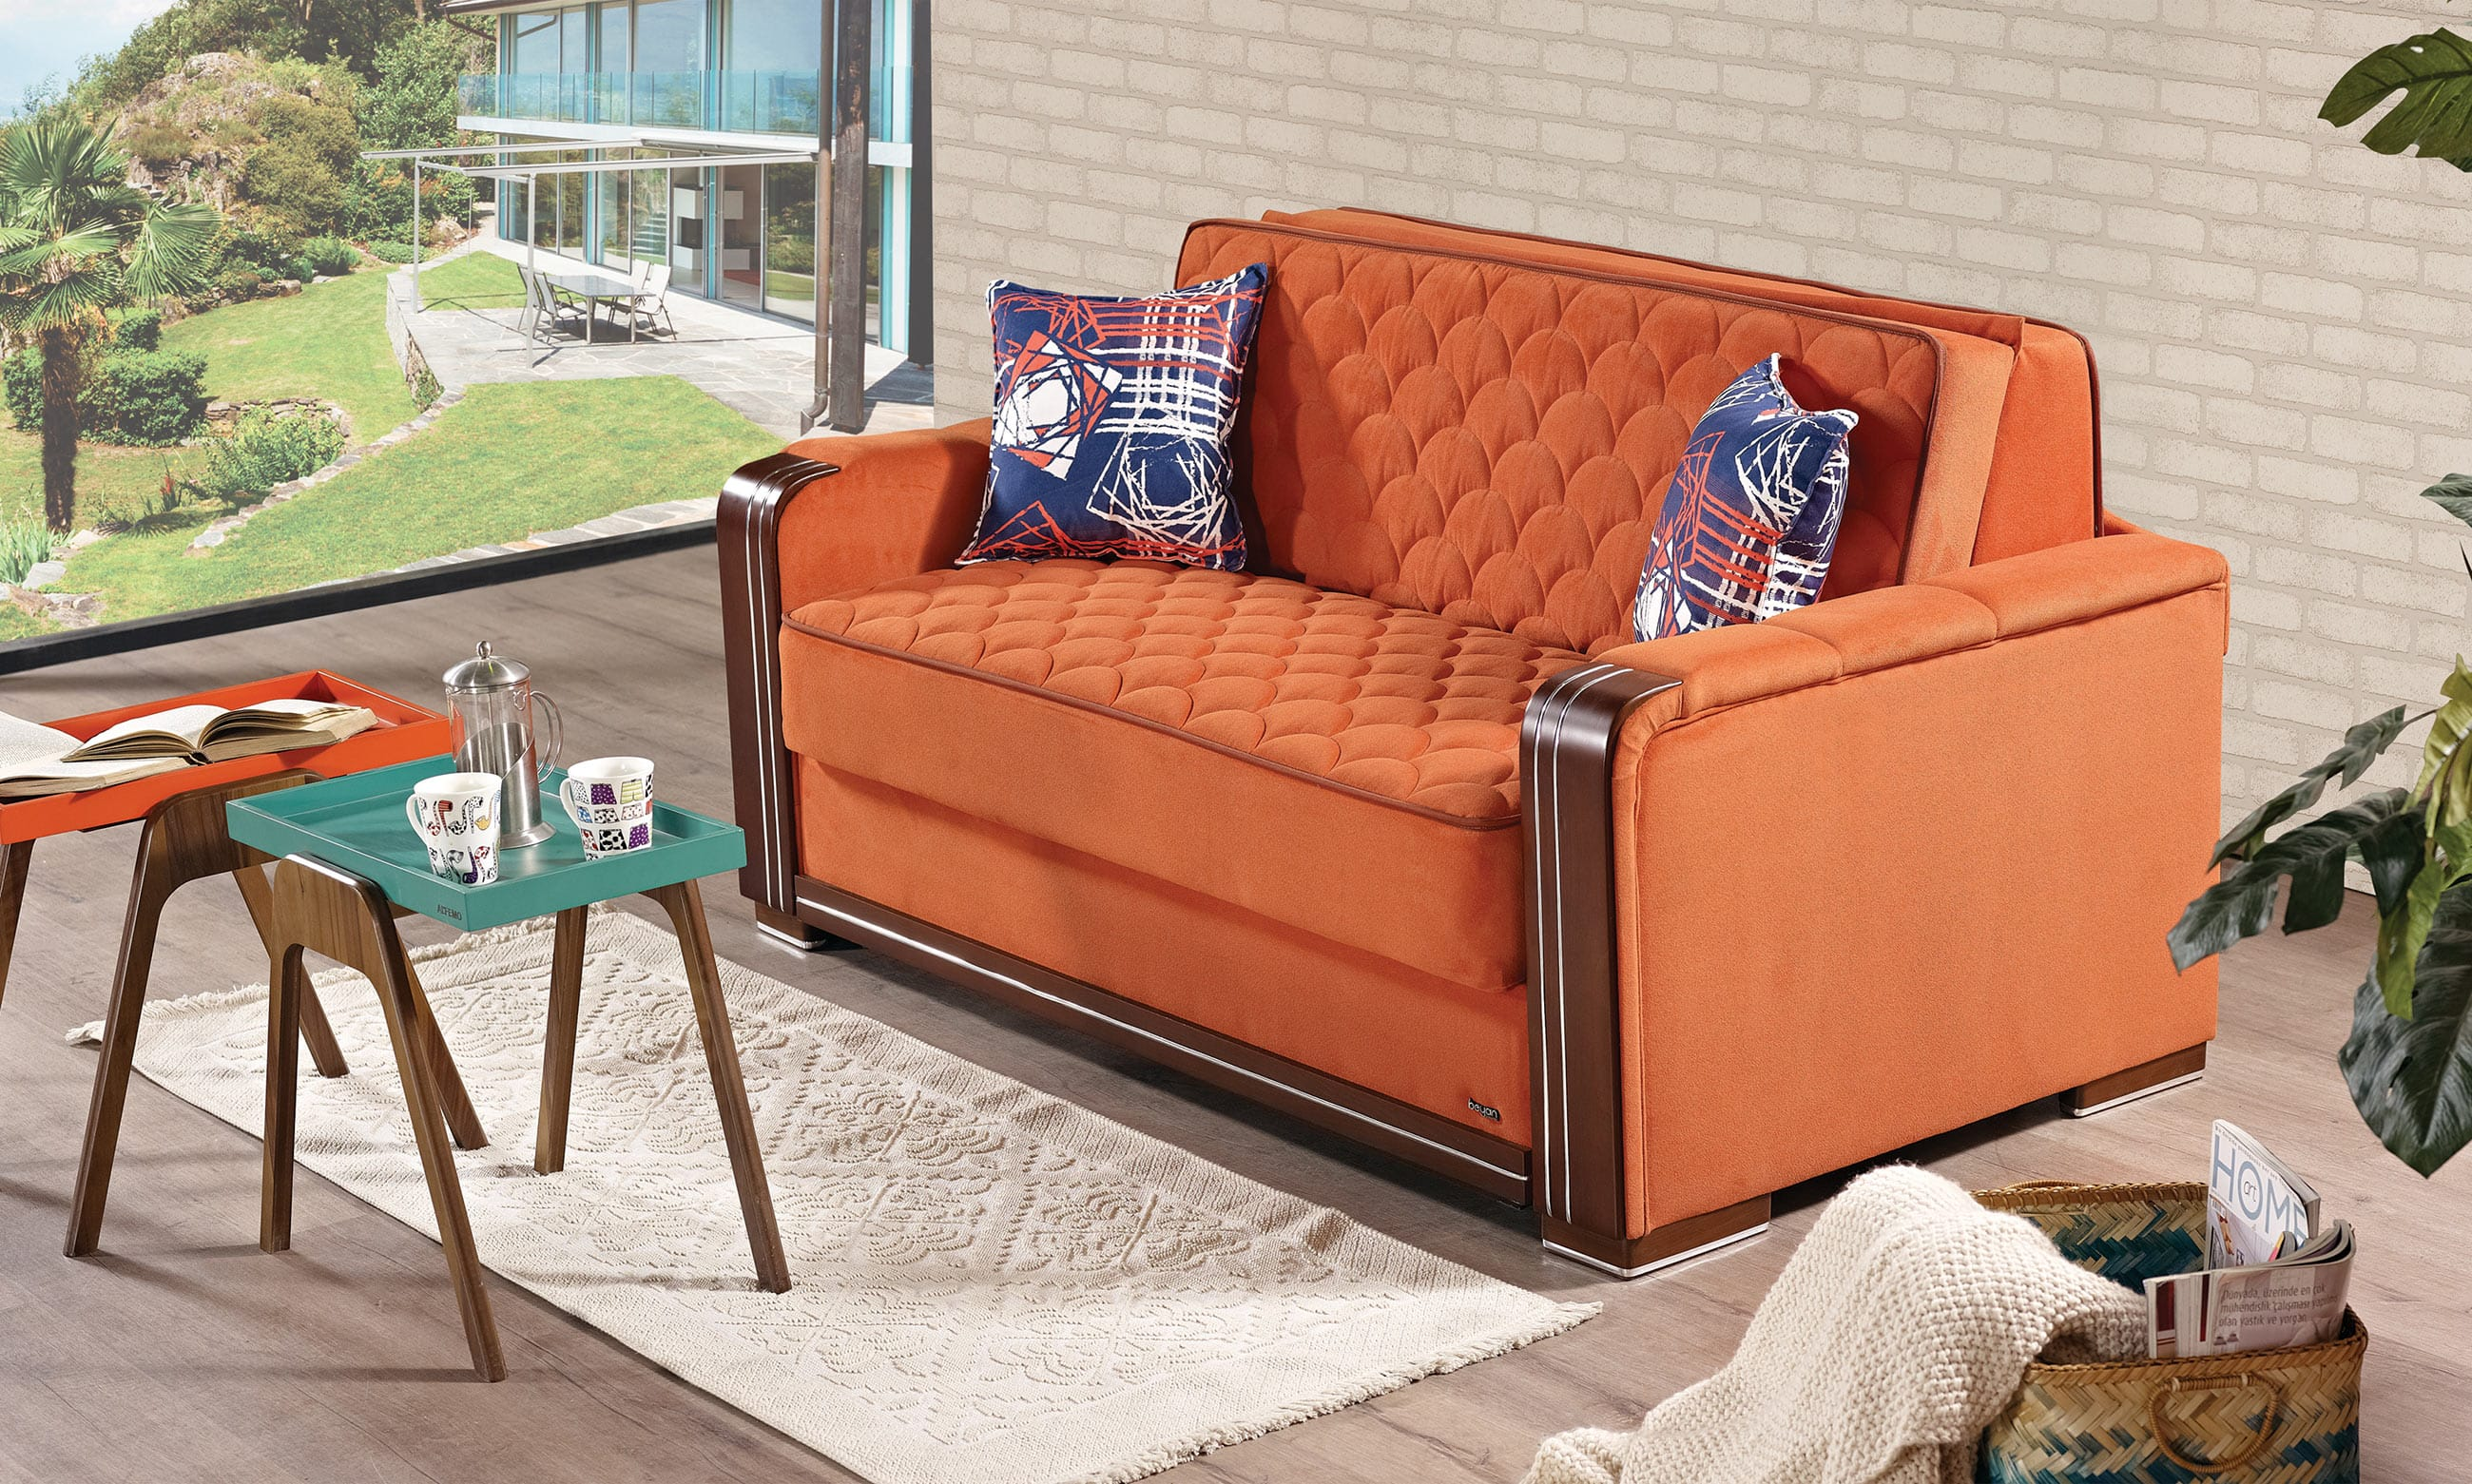 sharpen iccembed fabric qlt of image hei with kv usm furniture resmode op loveseat fmt sku city blue gray wid austin